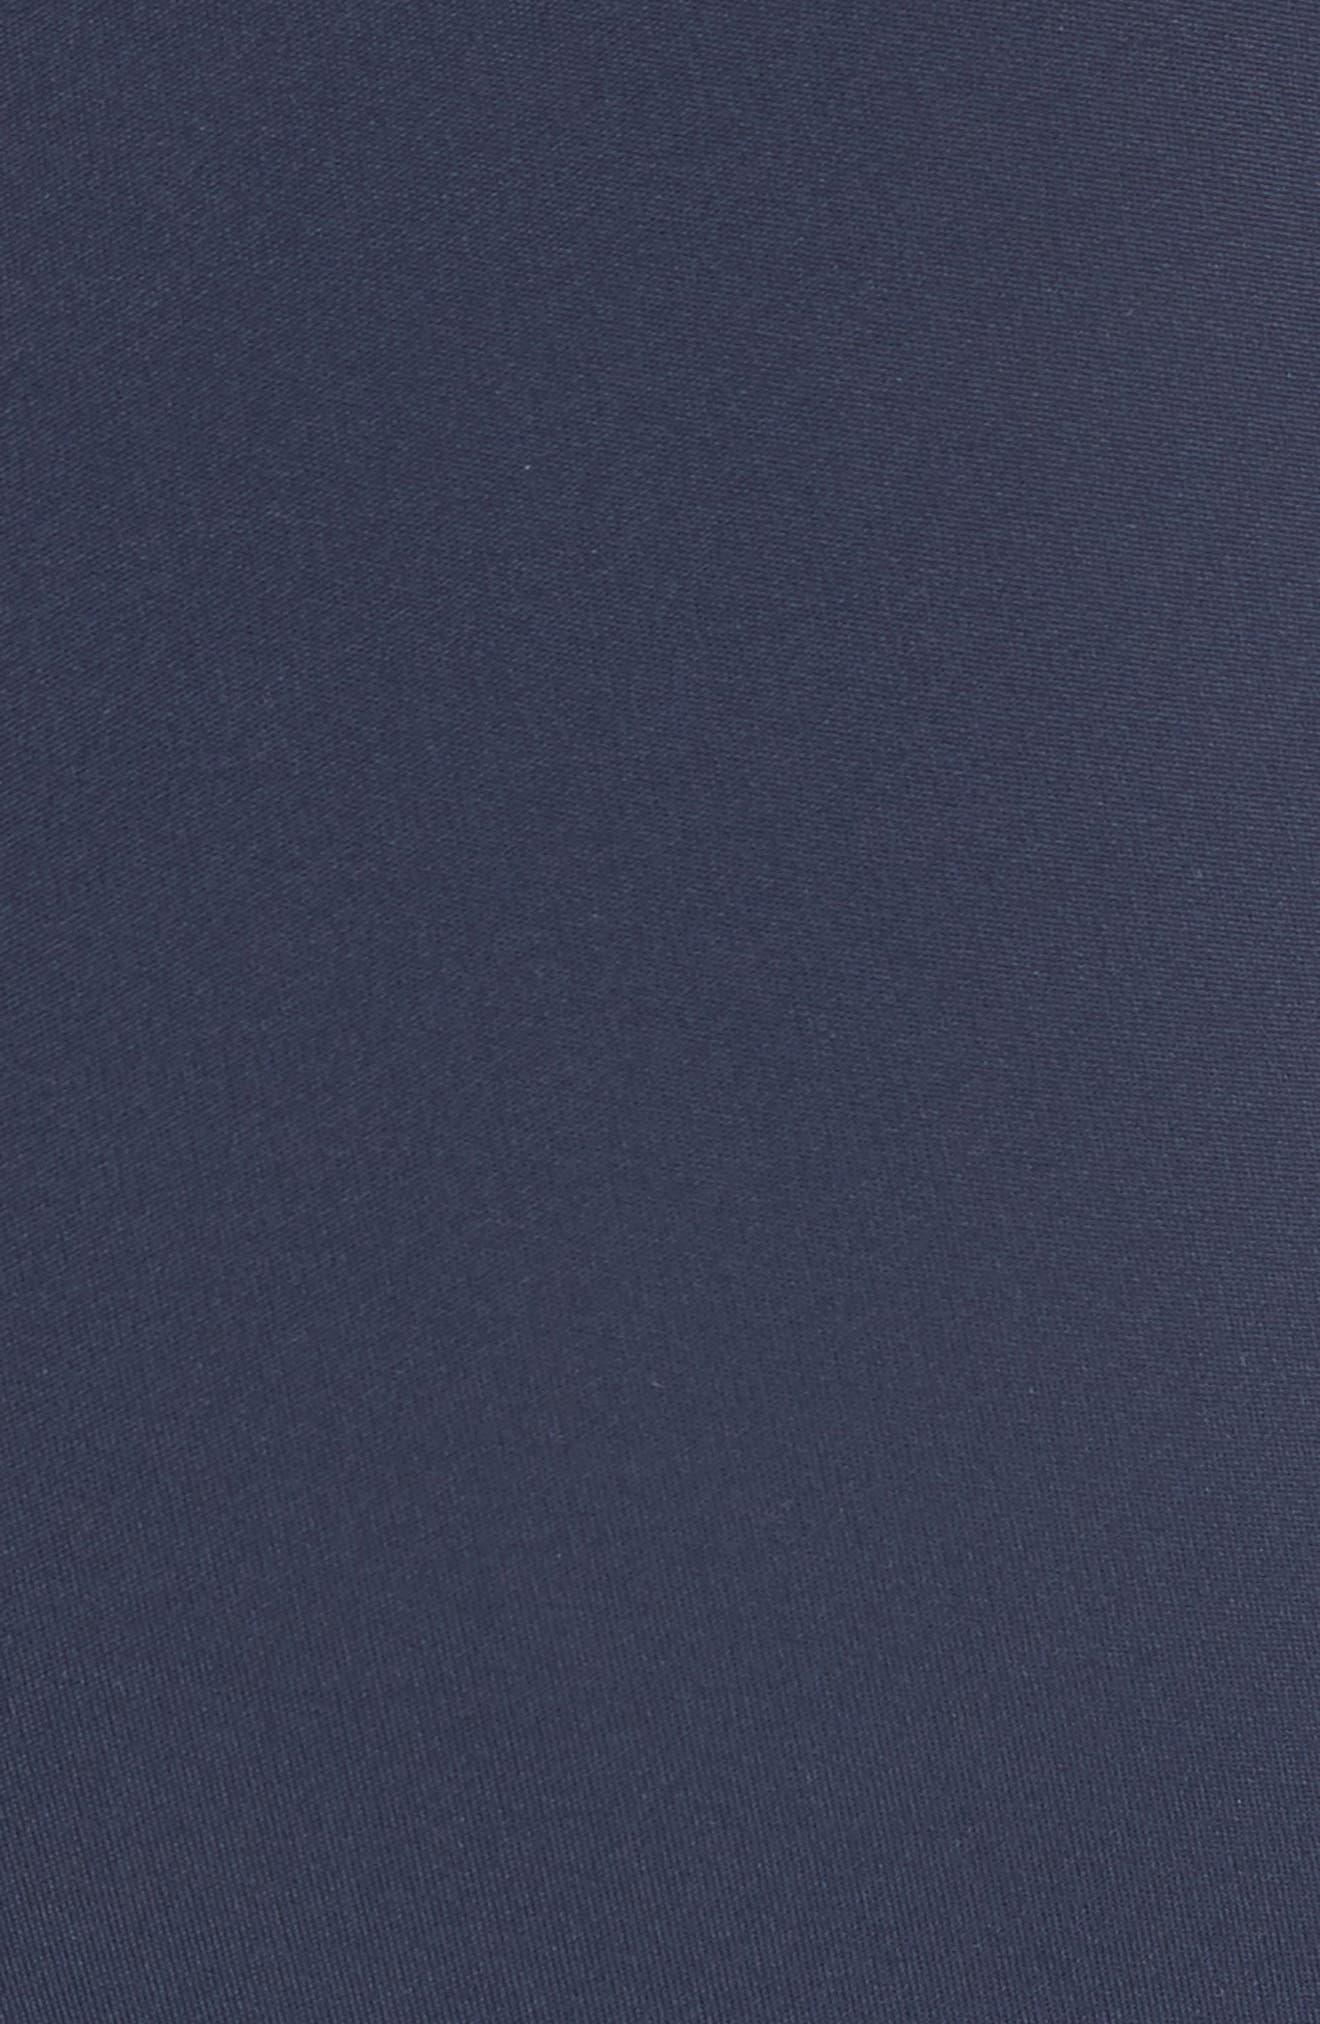 Diagonal Stripe Leggings,                             Alternate thumbnail 5, color,                             405